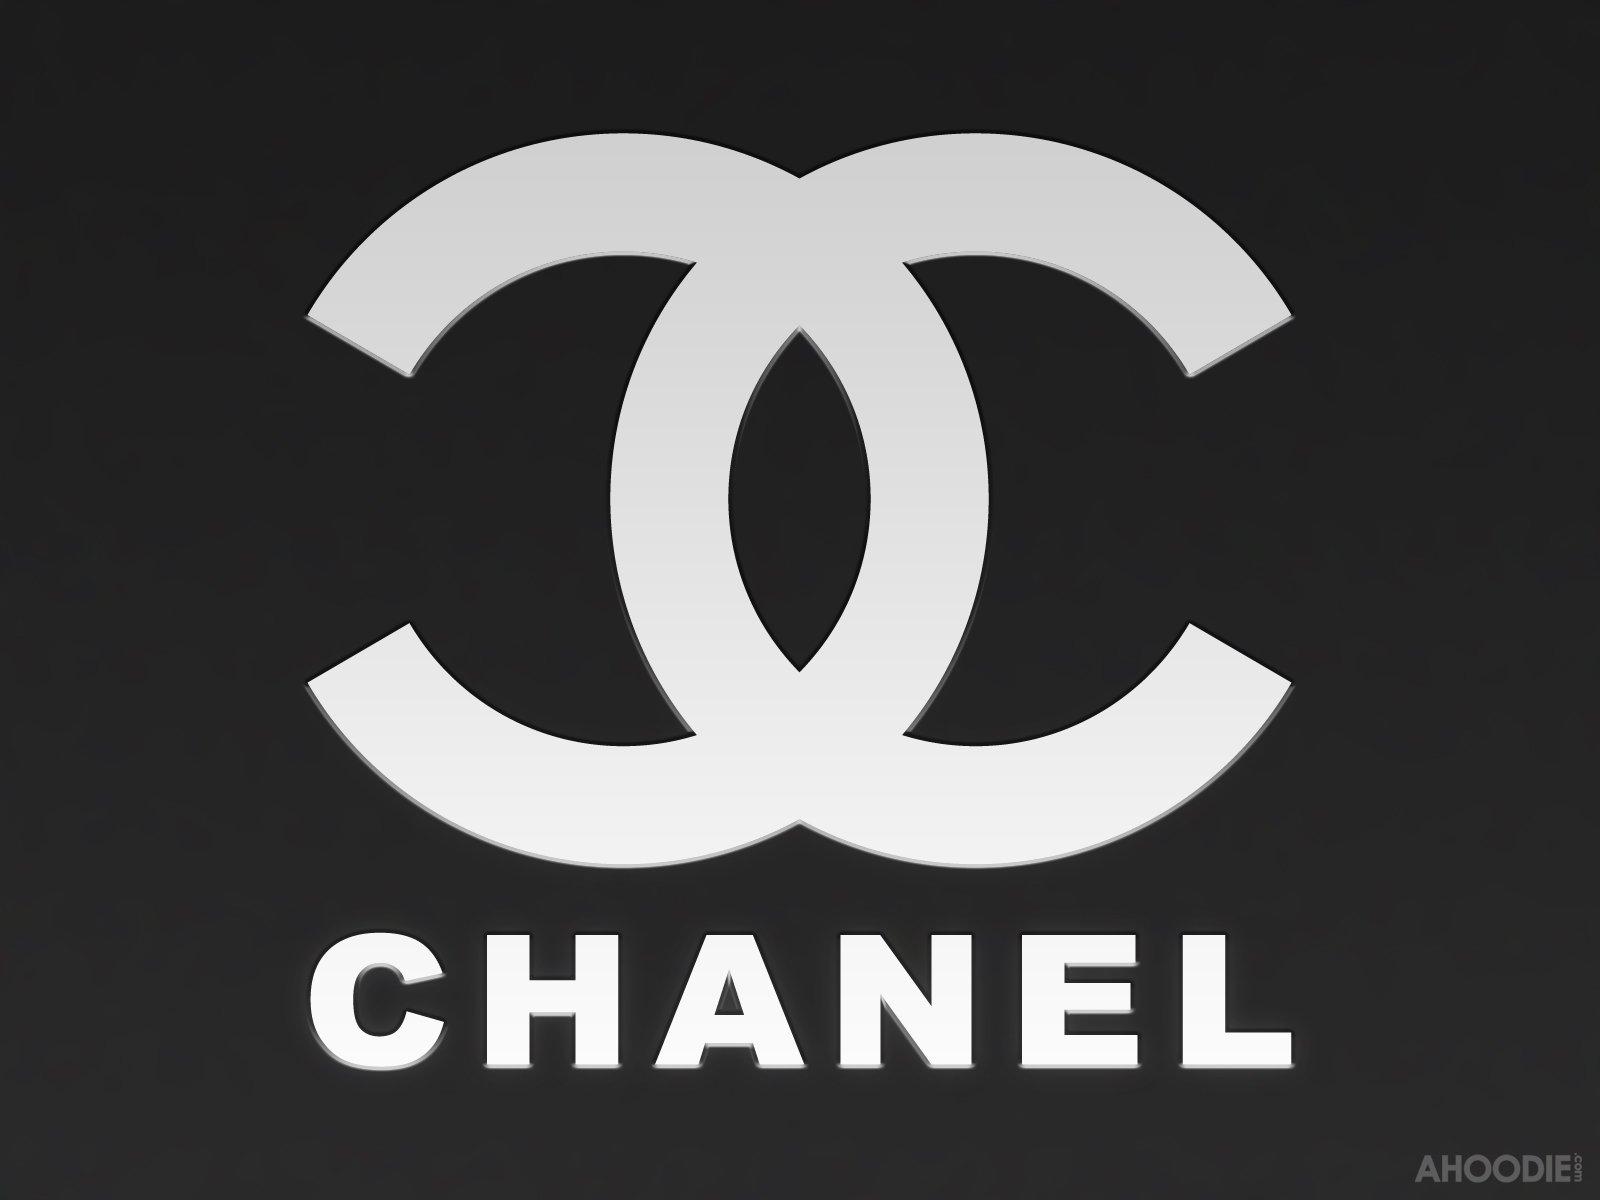 Коко шанель картинки логотип, открытке картинки последний